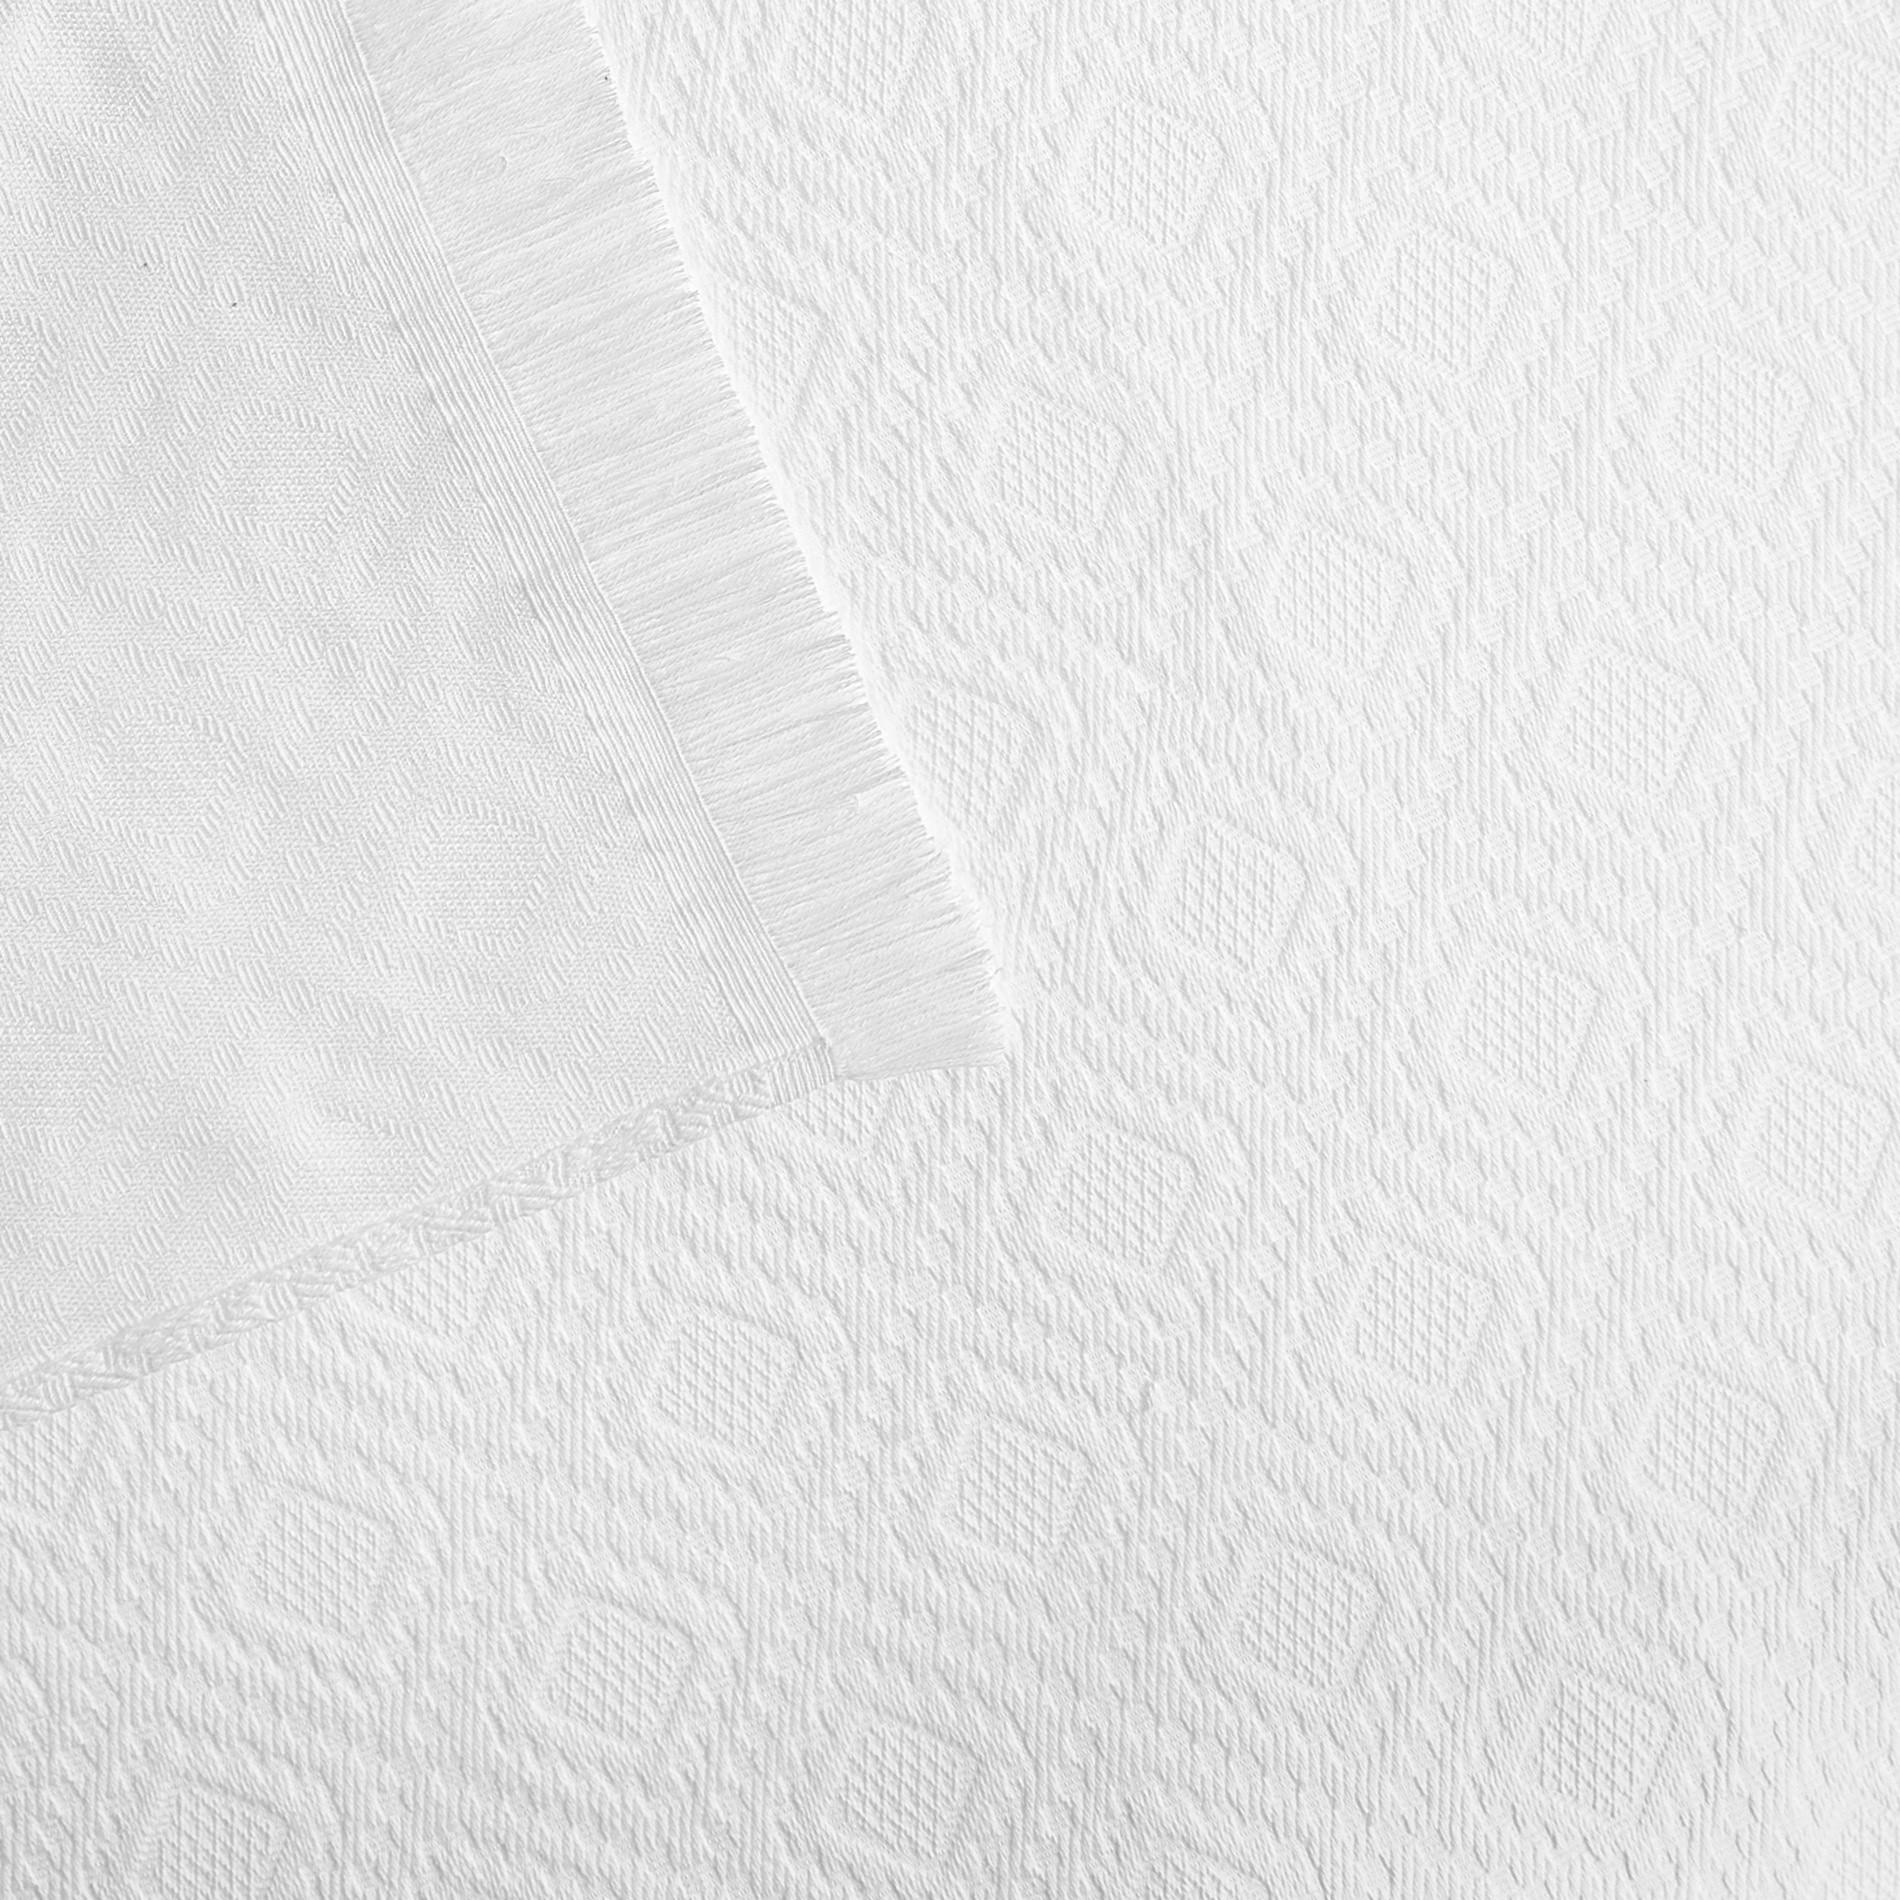 Copriletto cotone con frangette, Bianco, large image number 1